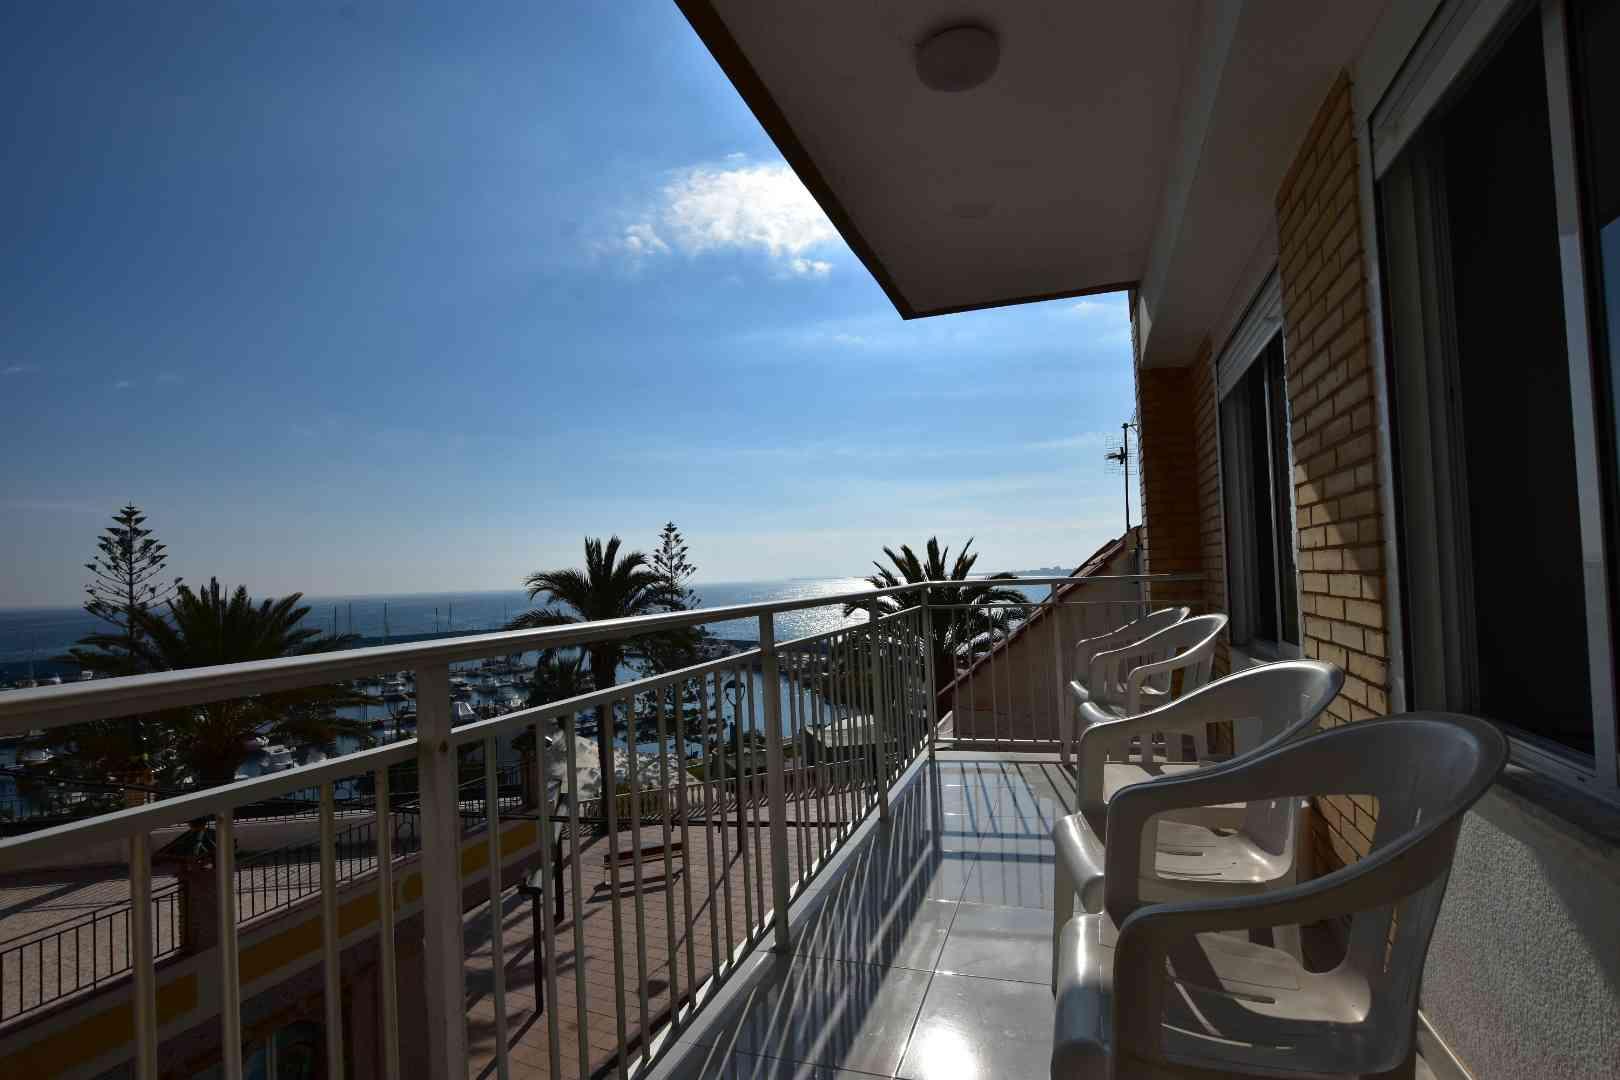 For sale: 3 bedroom apartment / flat in Torre de la Horadada, Costa Blanca